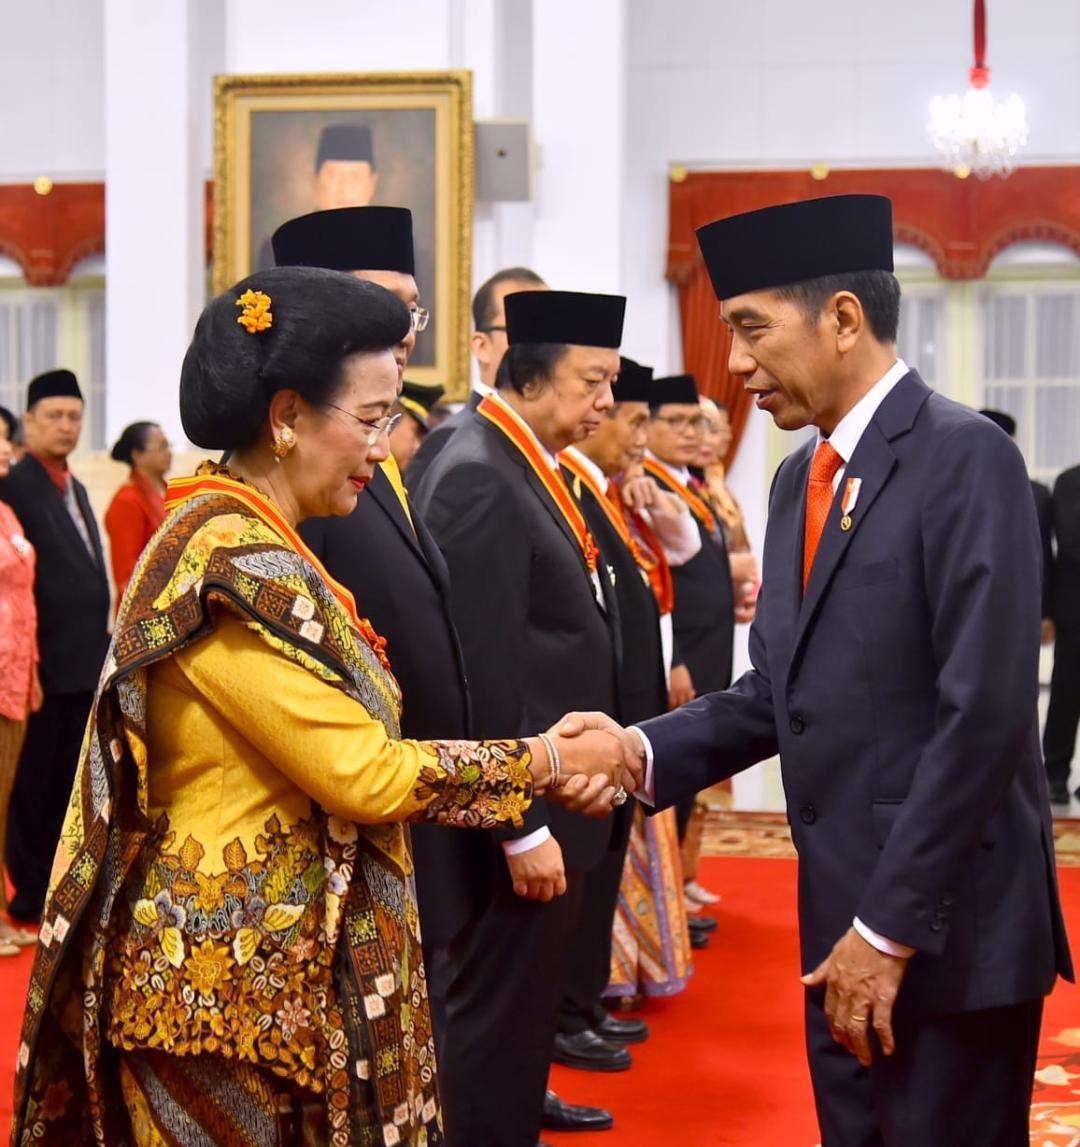 Sambut HUT ke-73 RI, Presiden Jokowi Anugerahkan Sejumlah Tanda Kehormatan